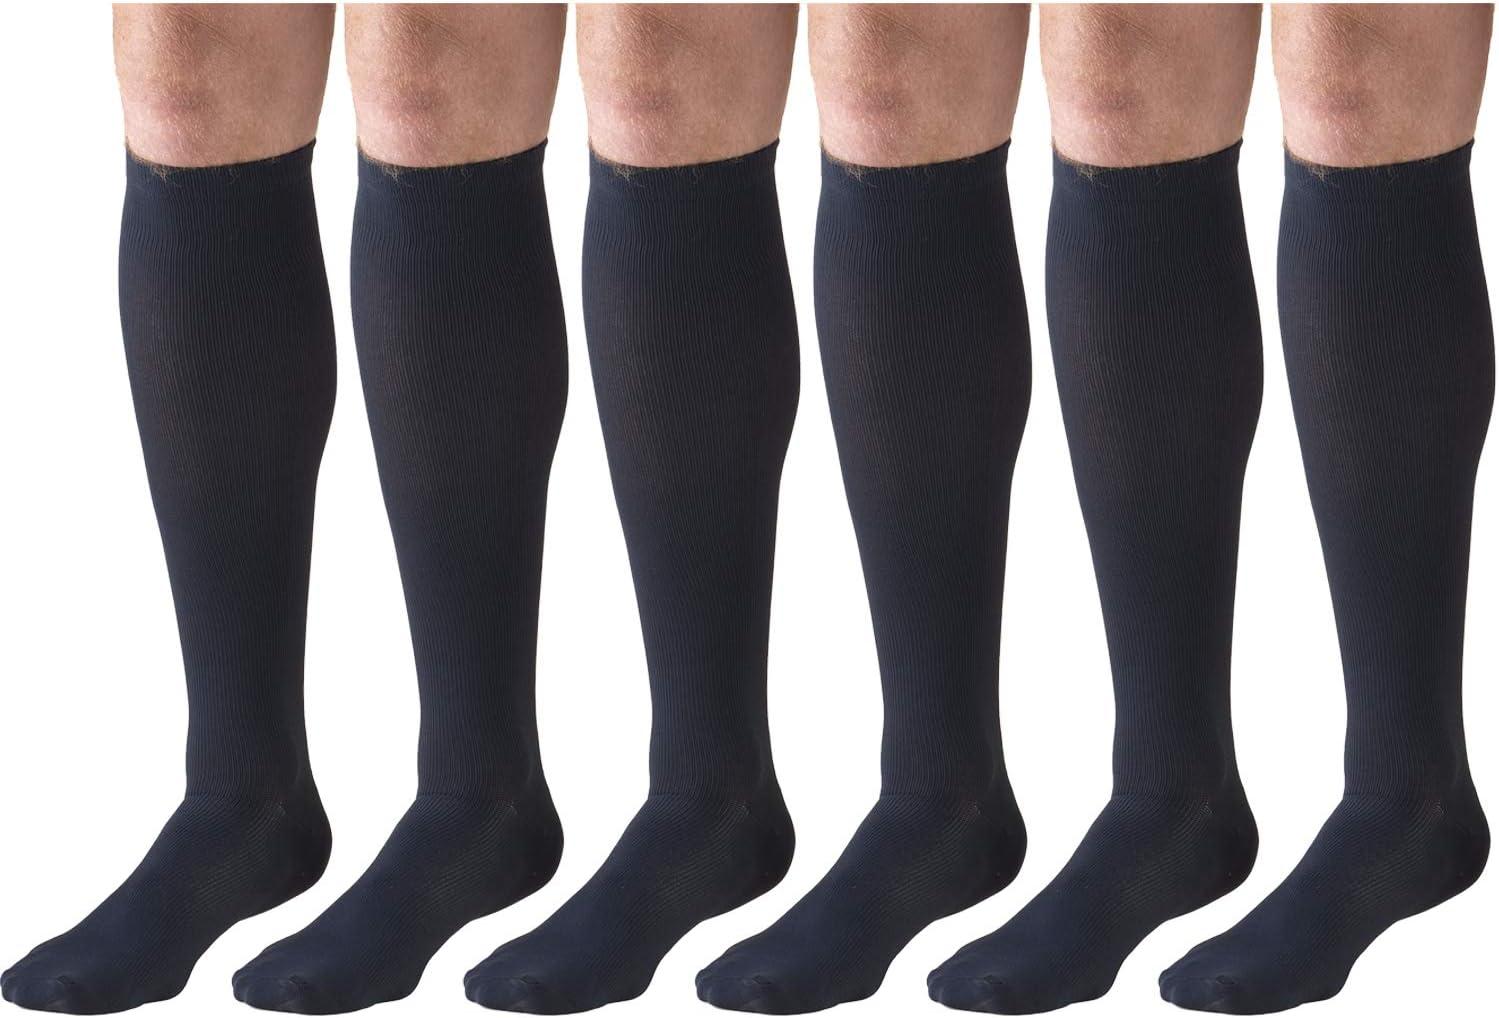 6 Pairs Mens Dress Socks Knee High Over Calf Length Black Medium Compression Socks 15-20 mmHg